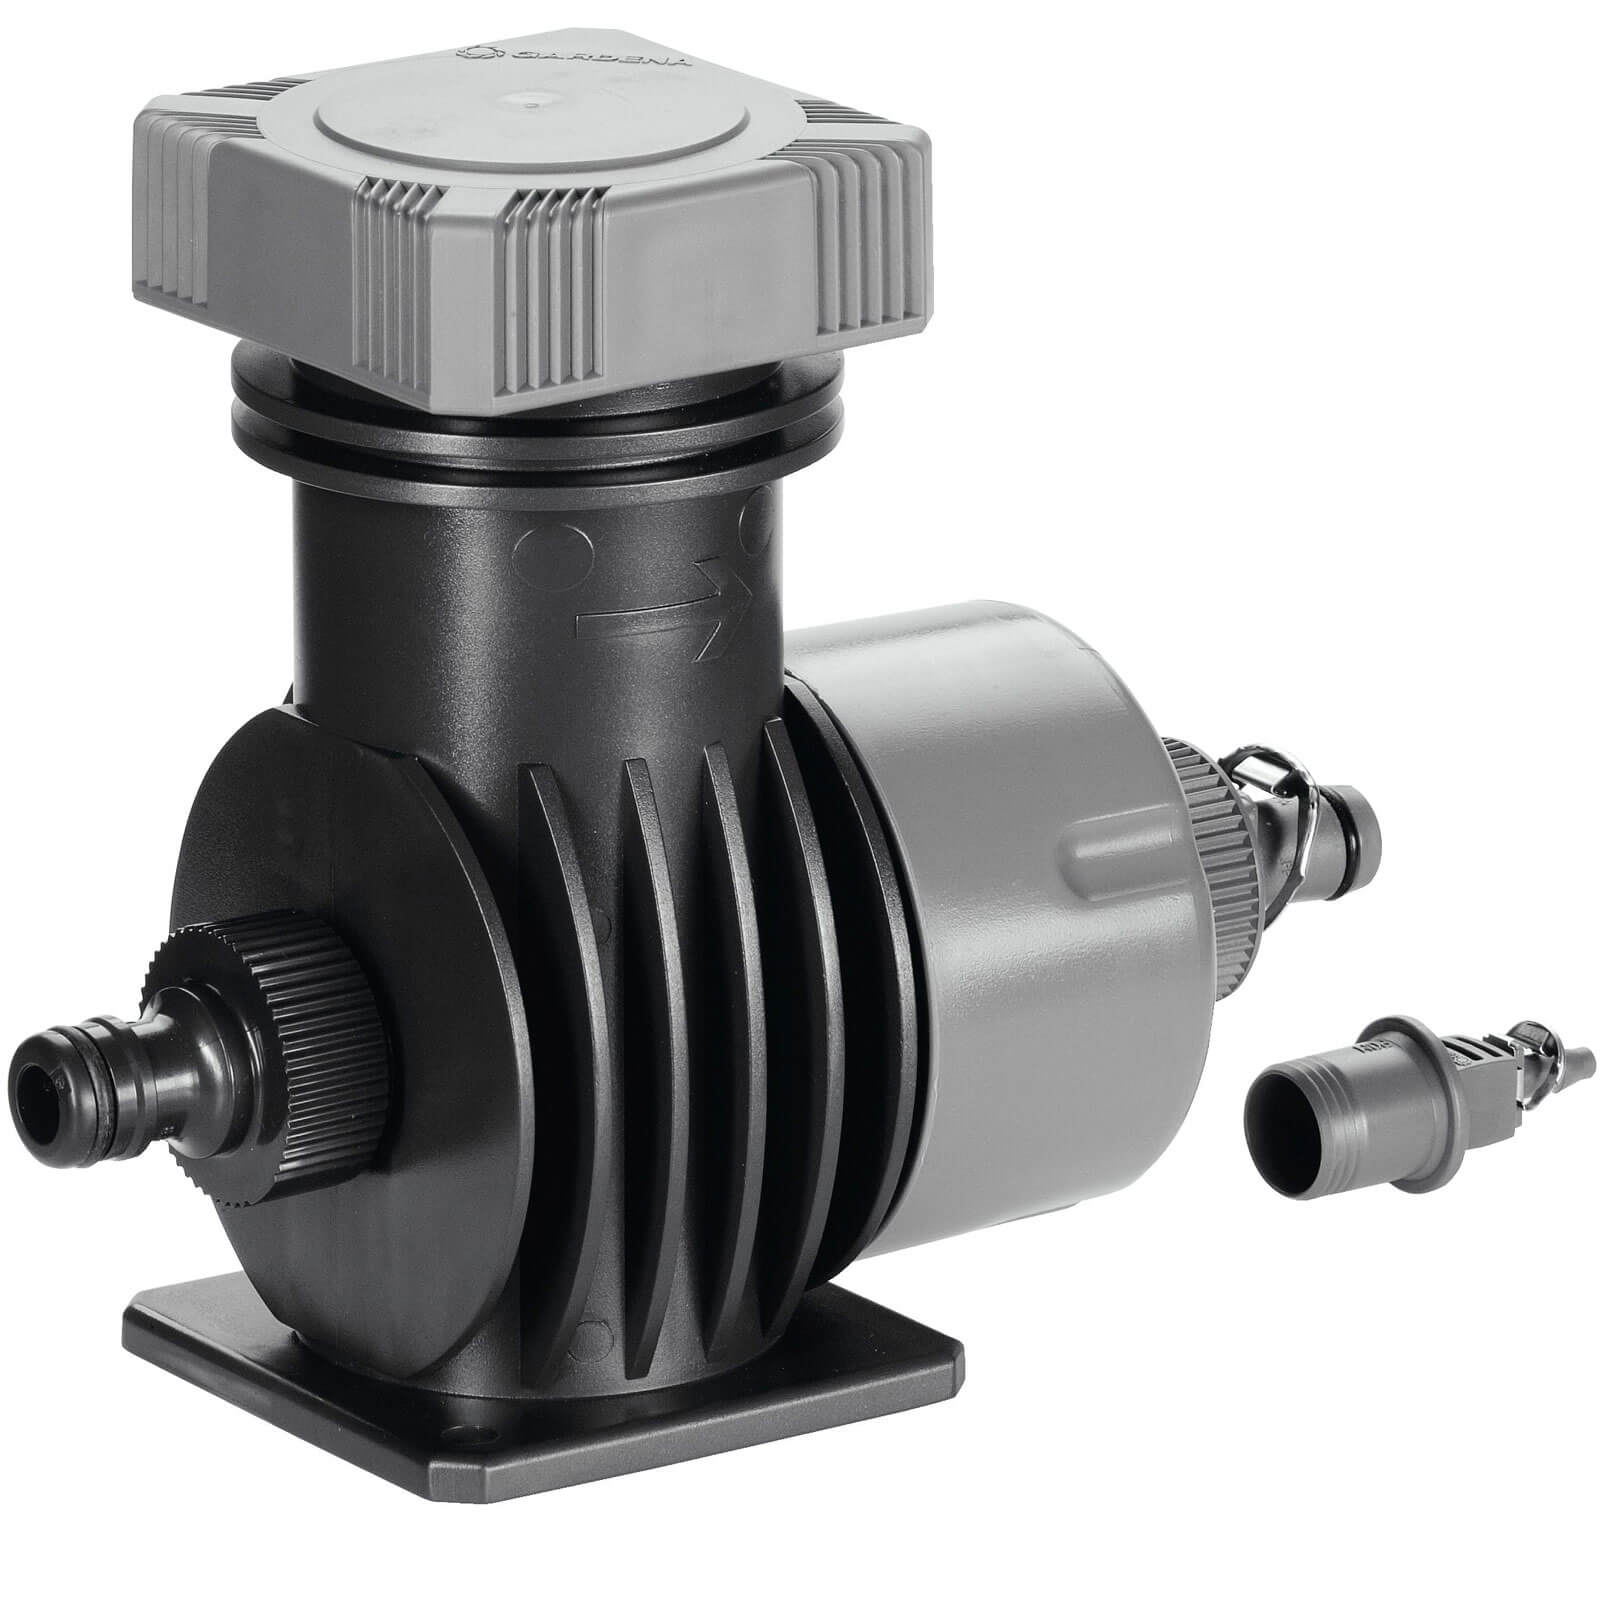 Gardena Micro Drip Master Unit 2000 Pressure Reducer (Micro Drip System)